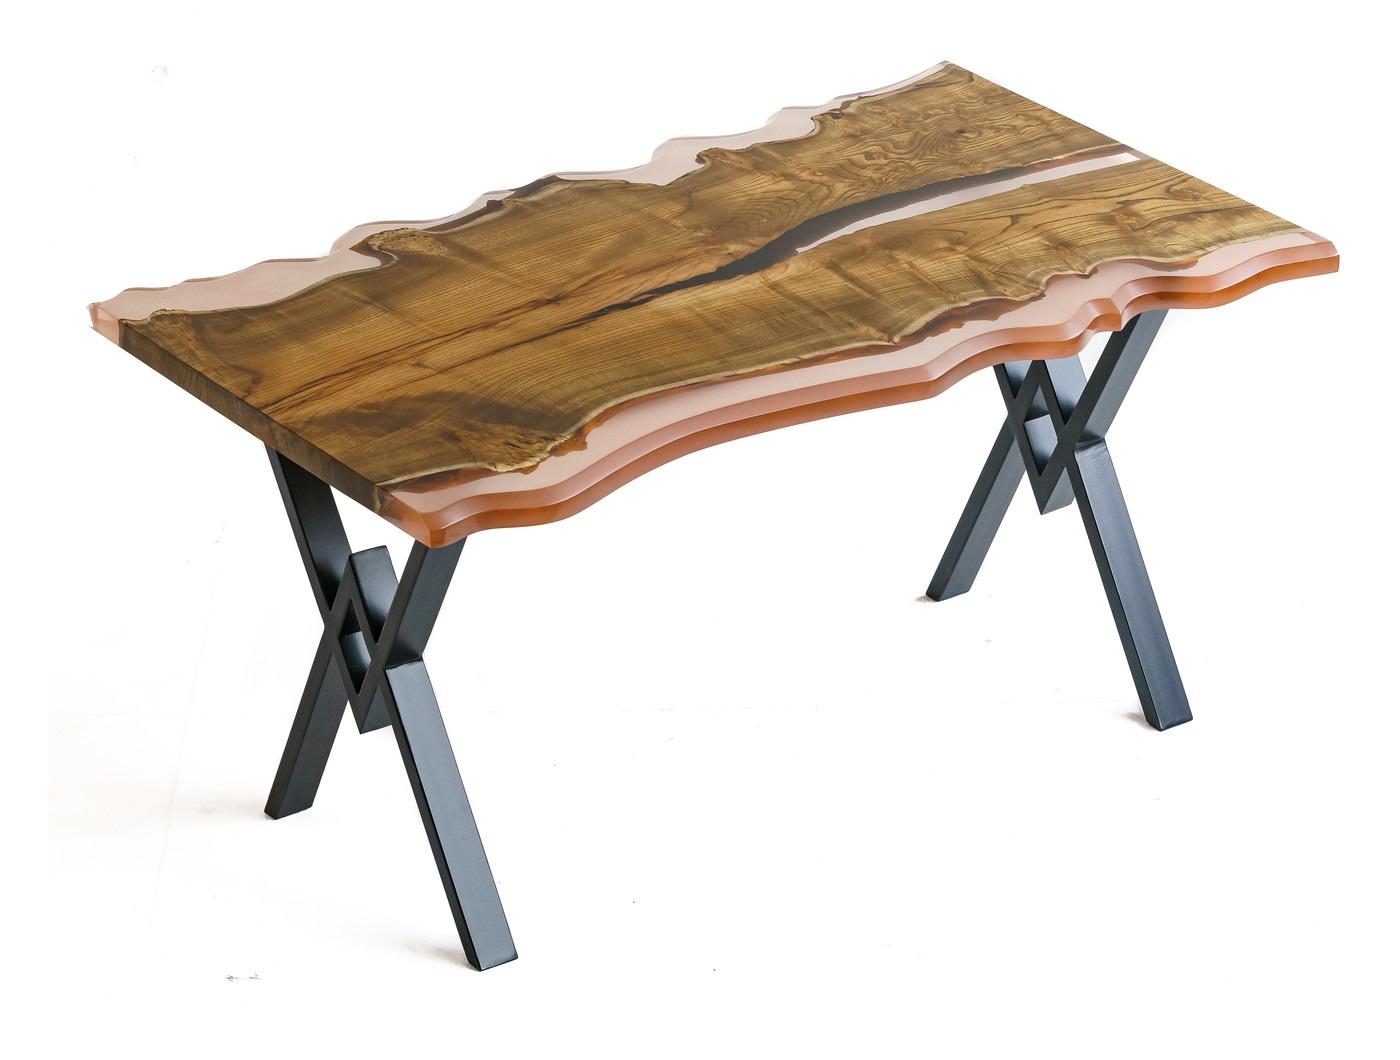 Обеденный стол (woodzpro) коричневый 90x75x145 см.